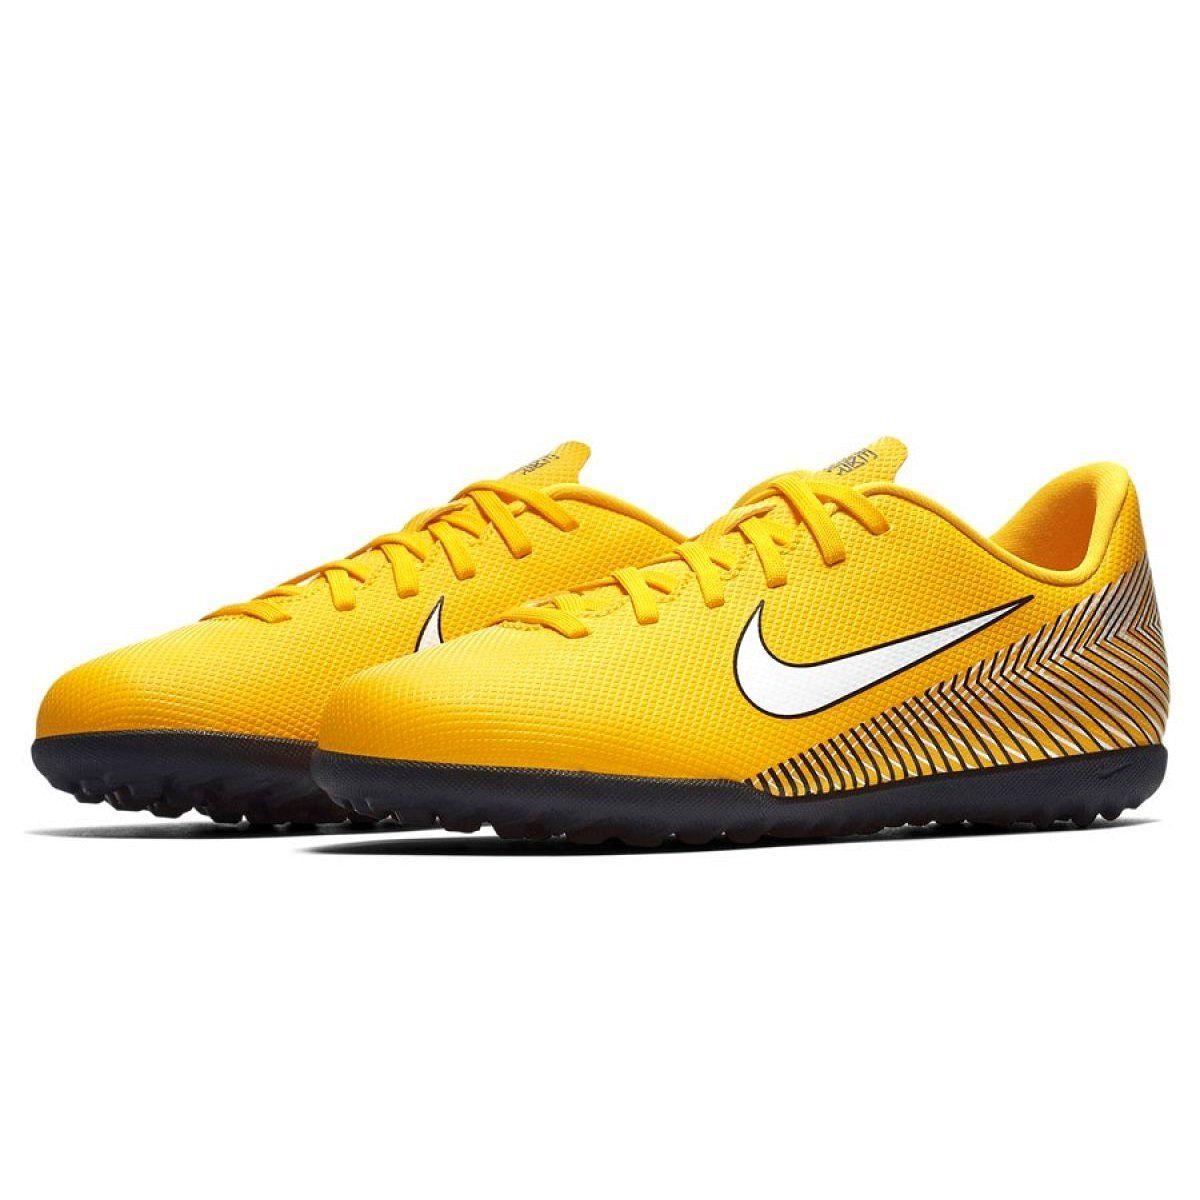 Buty Pilkarskie Nike Mercurial Vapor 12 Club Neymar Tf Jr Ao9478 710 Zolte Zolte Nike Nike Cortez Sneaker Sneakers Nike